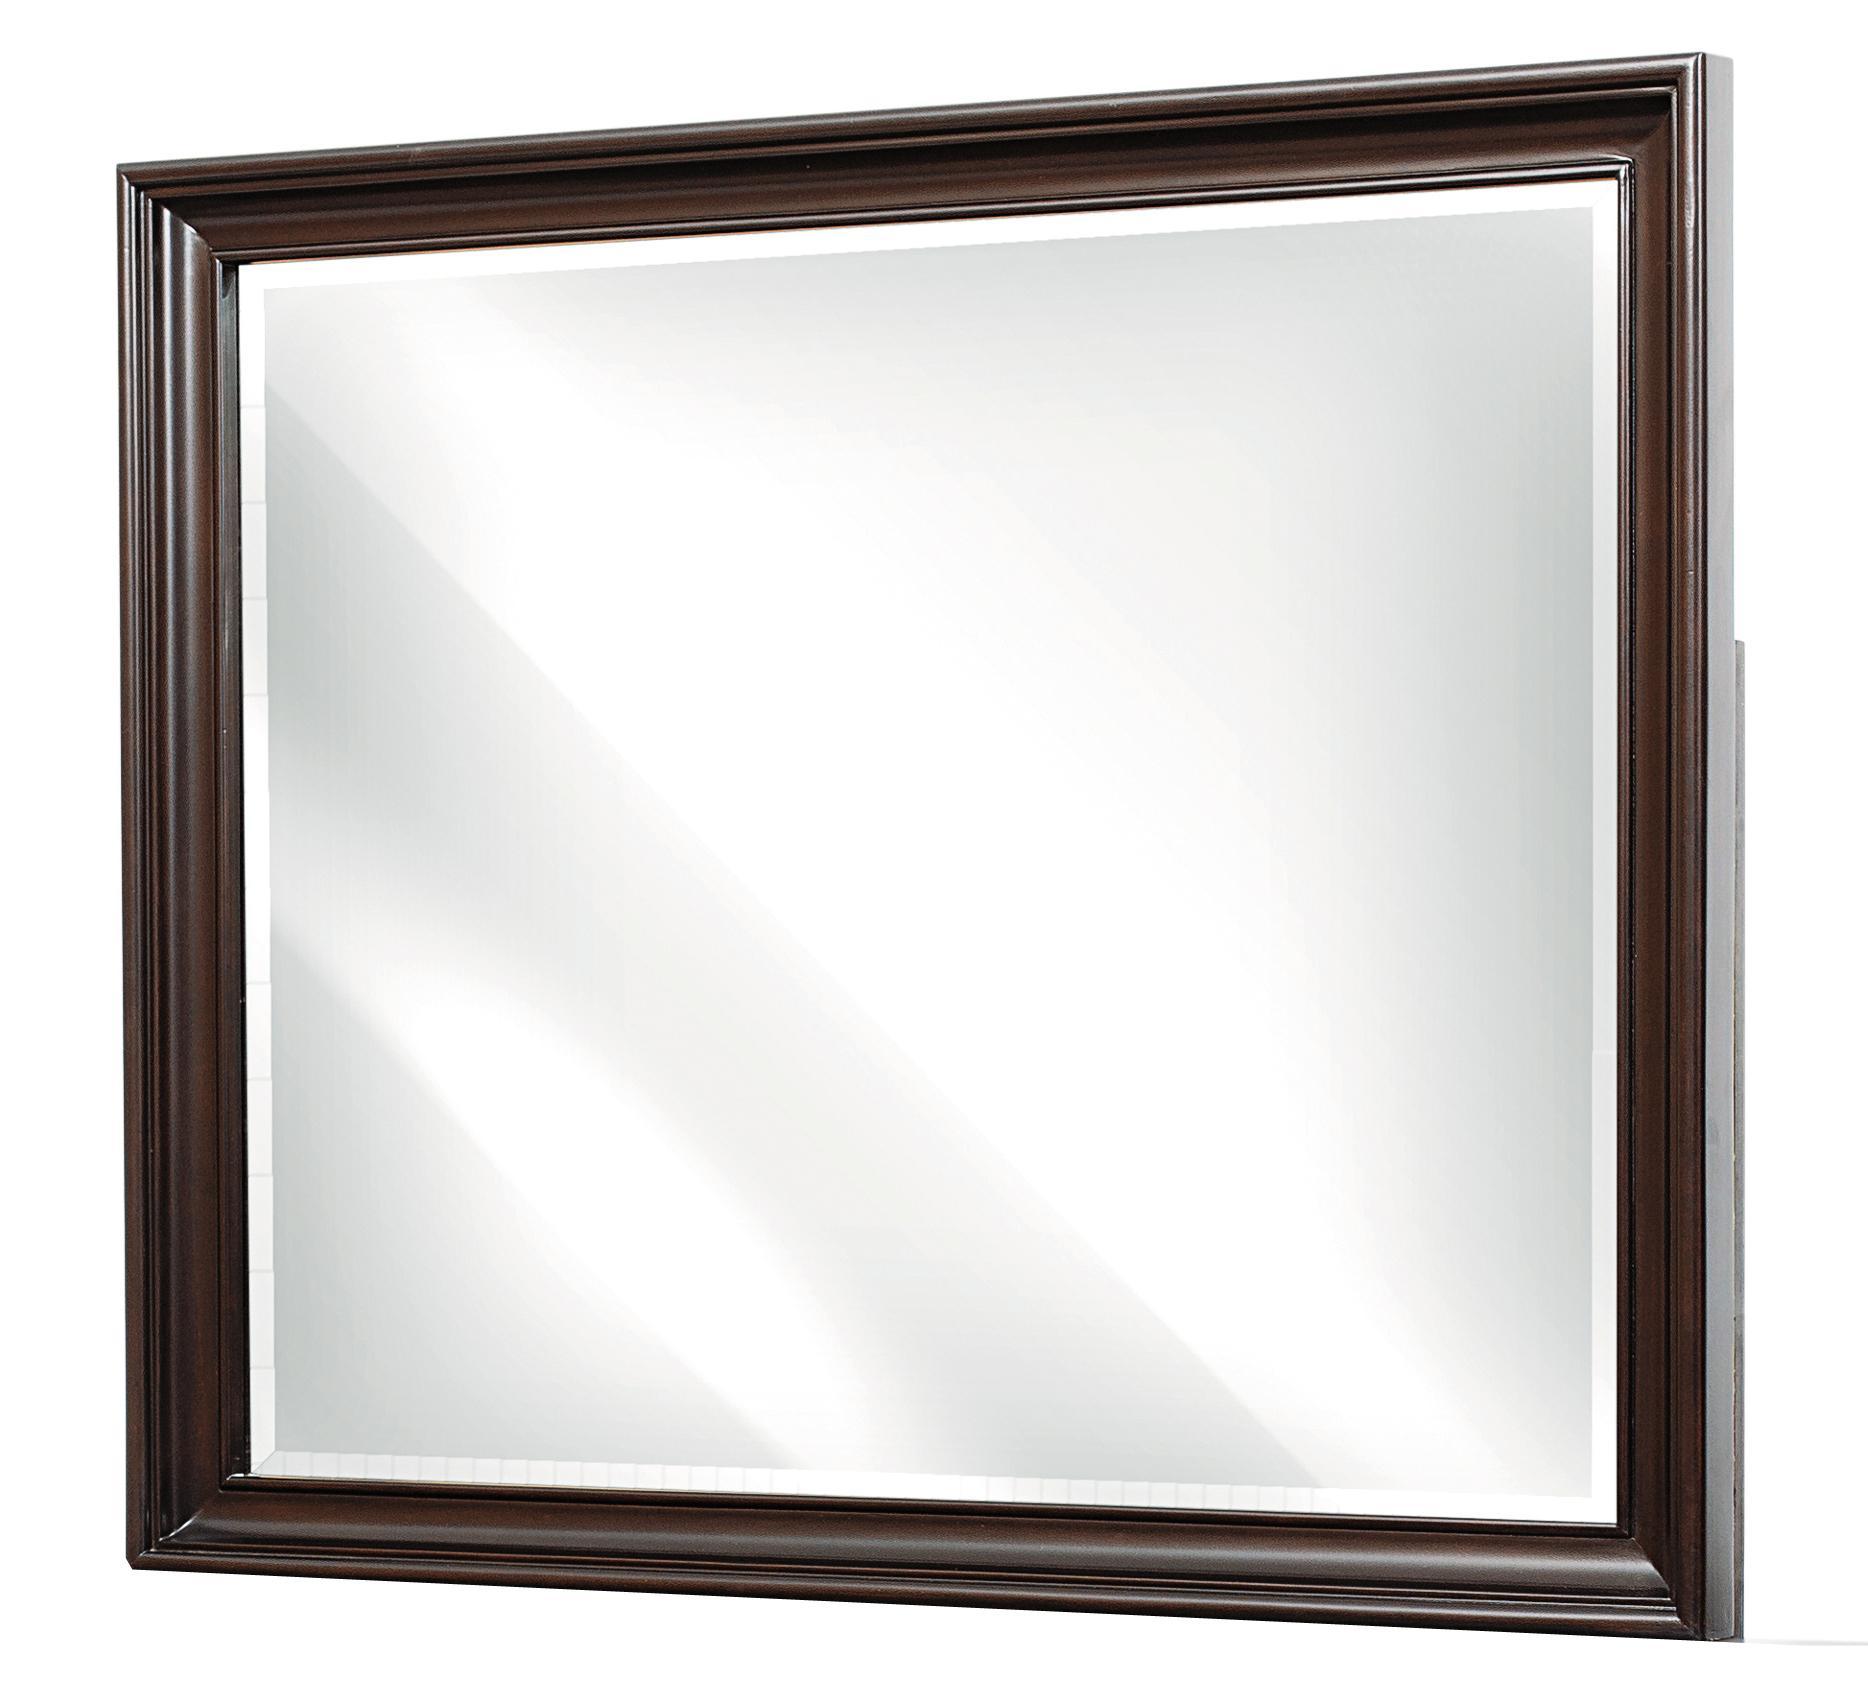 Samuel Lawrence Brighton Landscape Mirror - Item Number: 8672-030